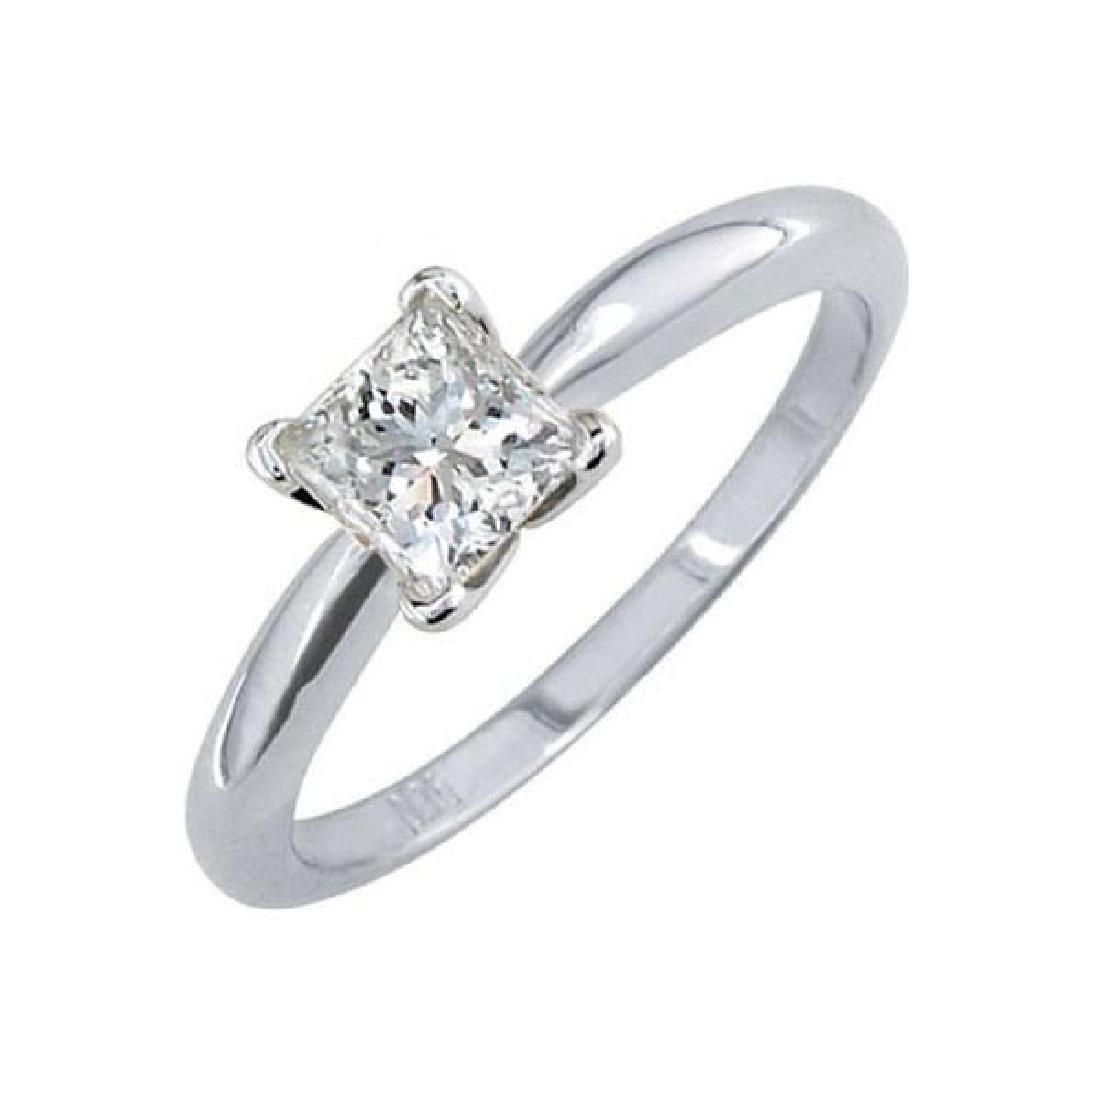 Certified 1.05 CTW Princess Diamond Solitaire 14k Ring